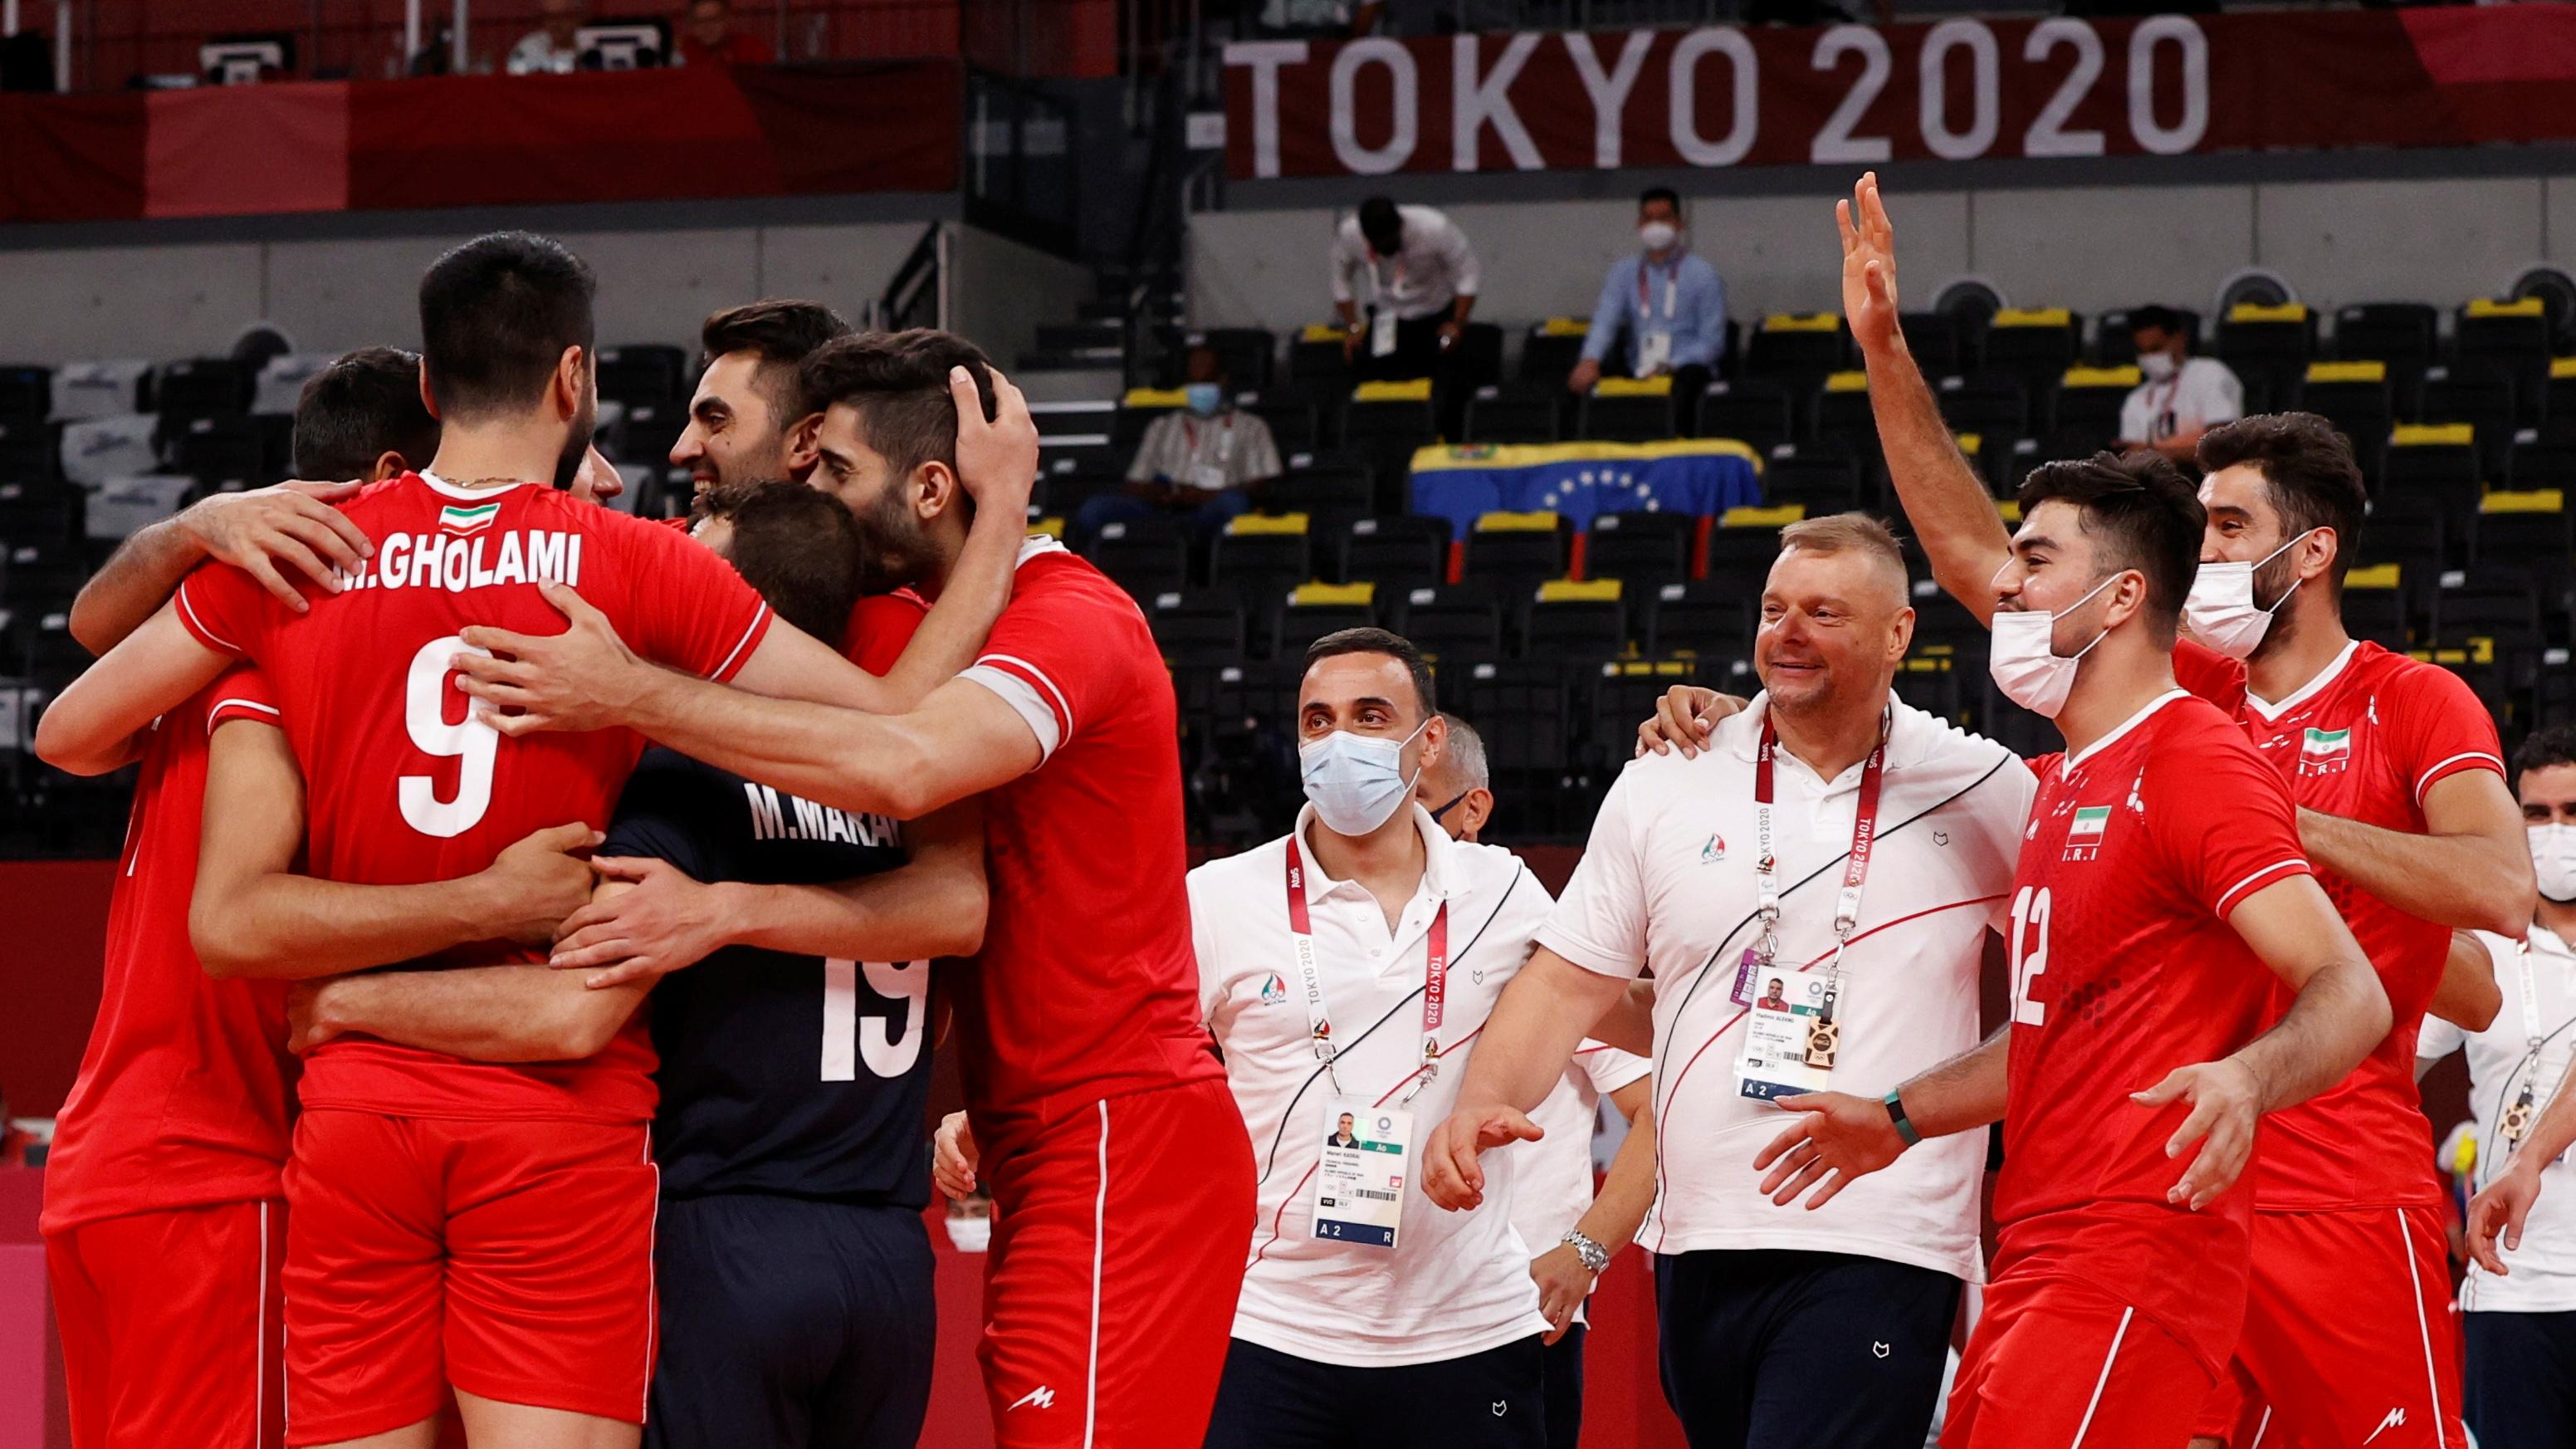 Tokyo 2020 Olympics - Volleyball - Men's Pool A - Iran v Venezuela - Ariake Arena, Tokyo, Japan – July 26, 2021. Team members of Iran celebrate after the match. REUTERS/Valentyn Ogirenko